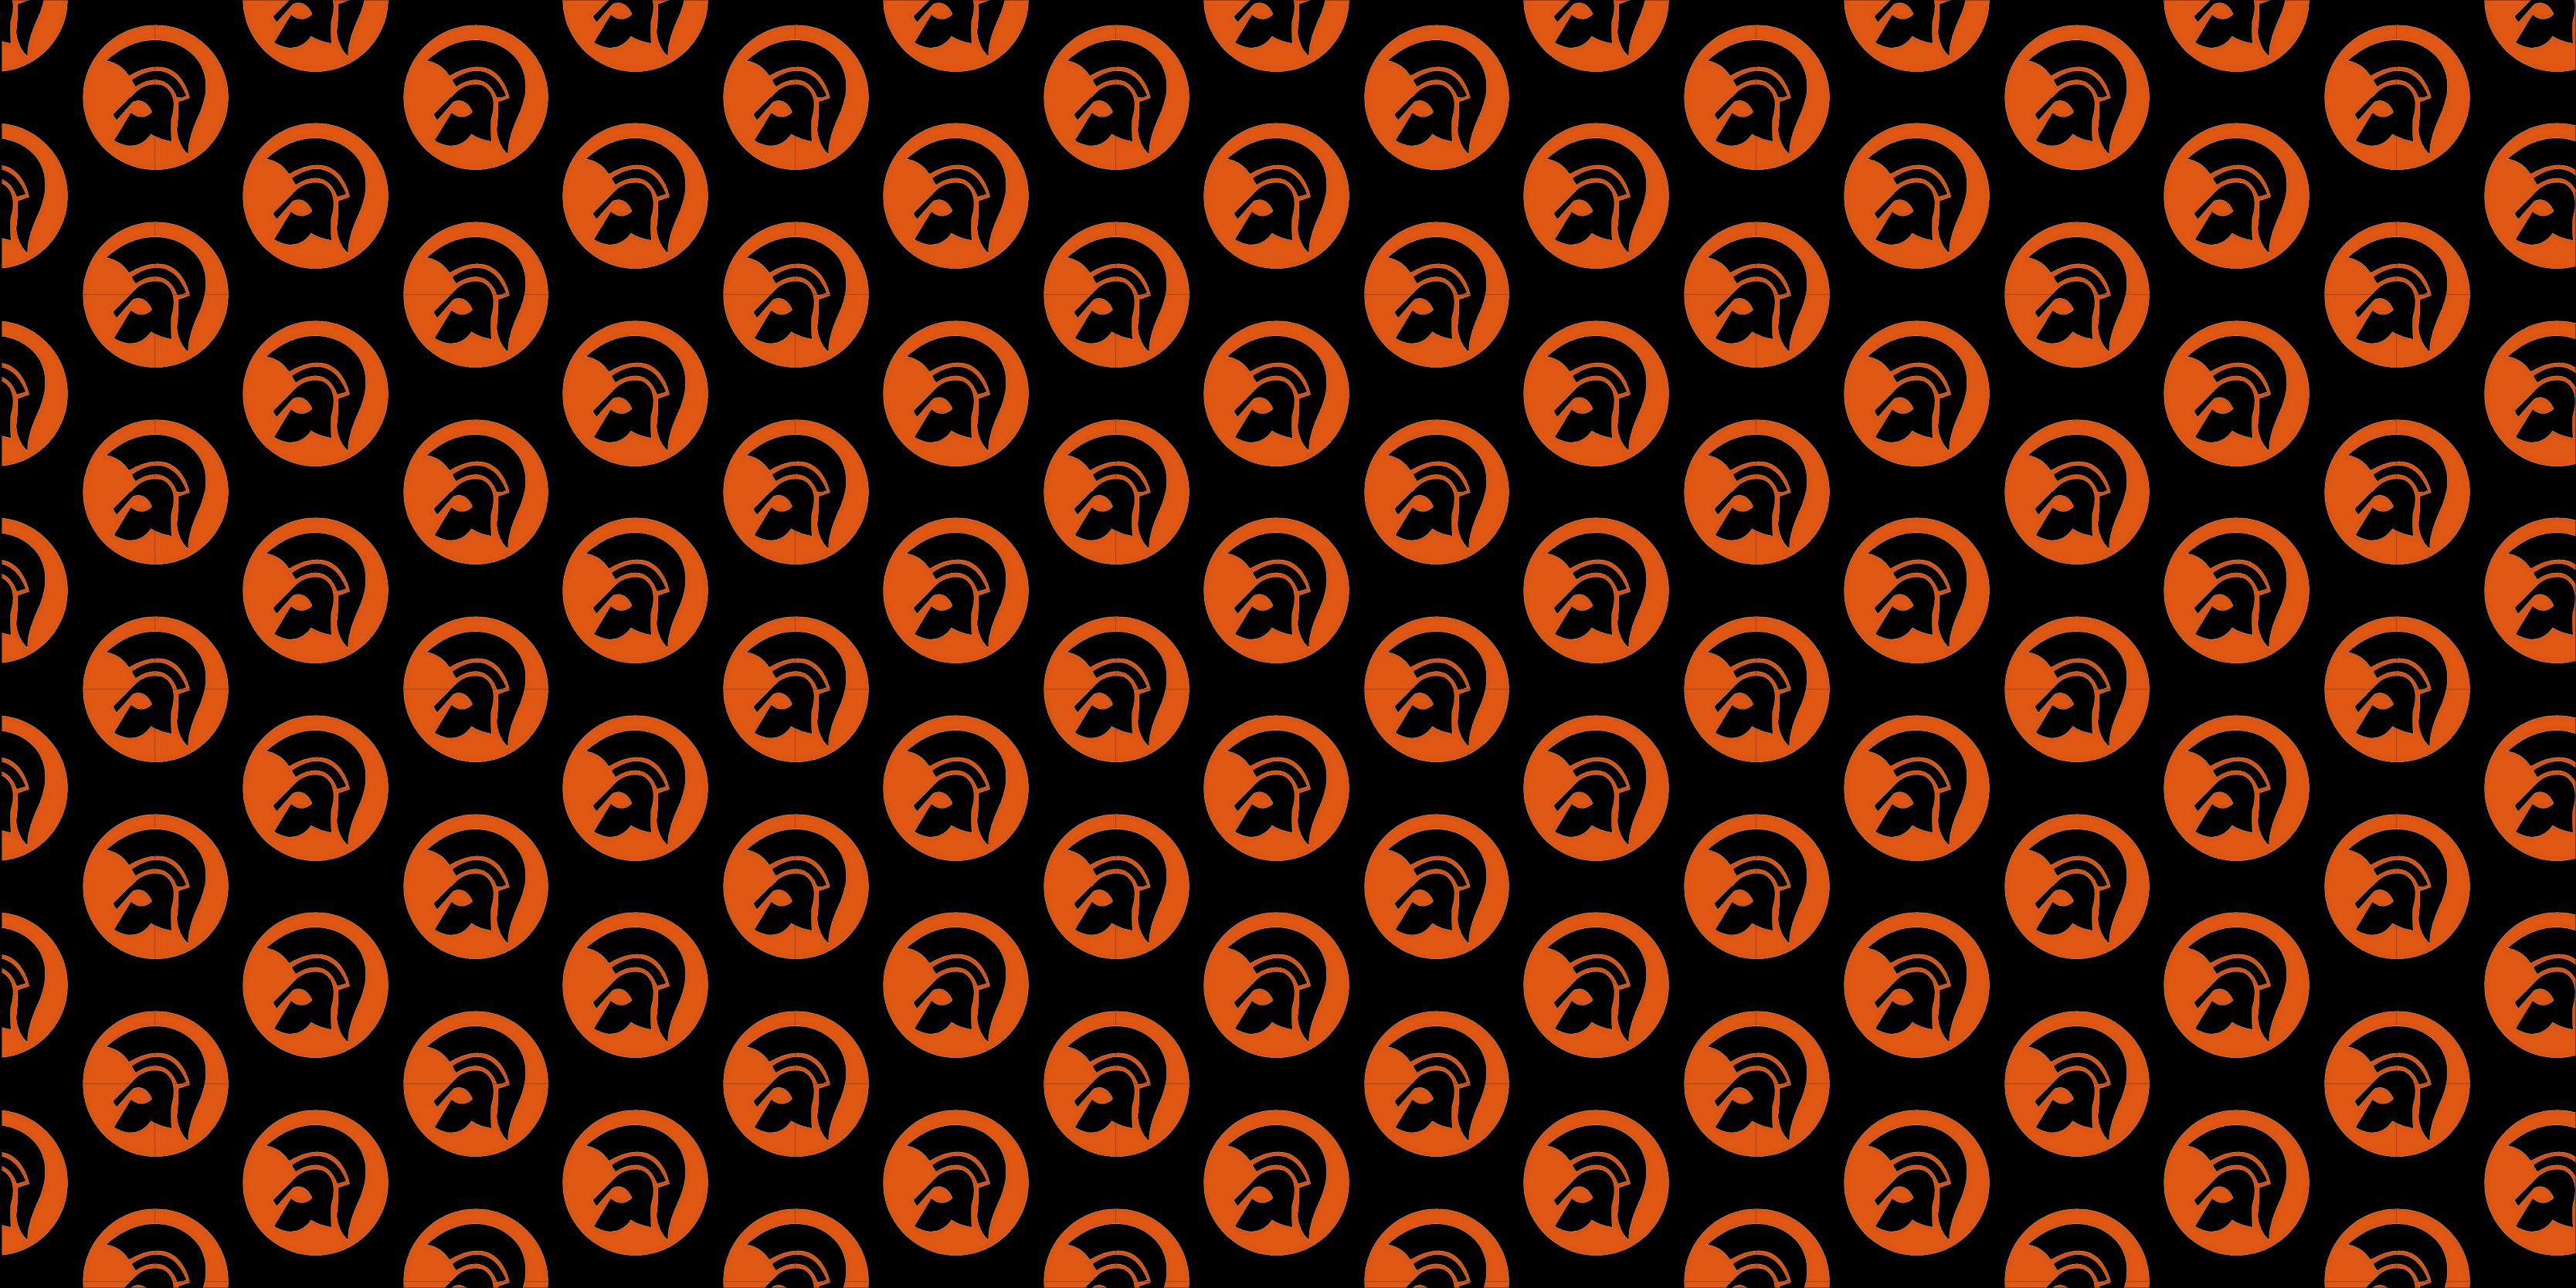 trojan pattern